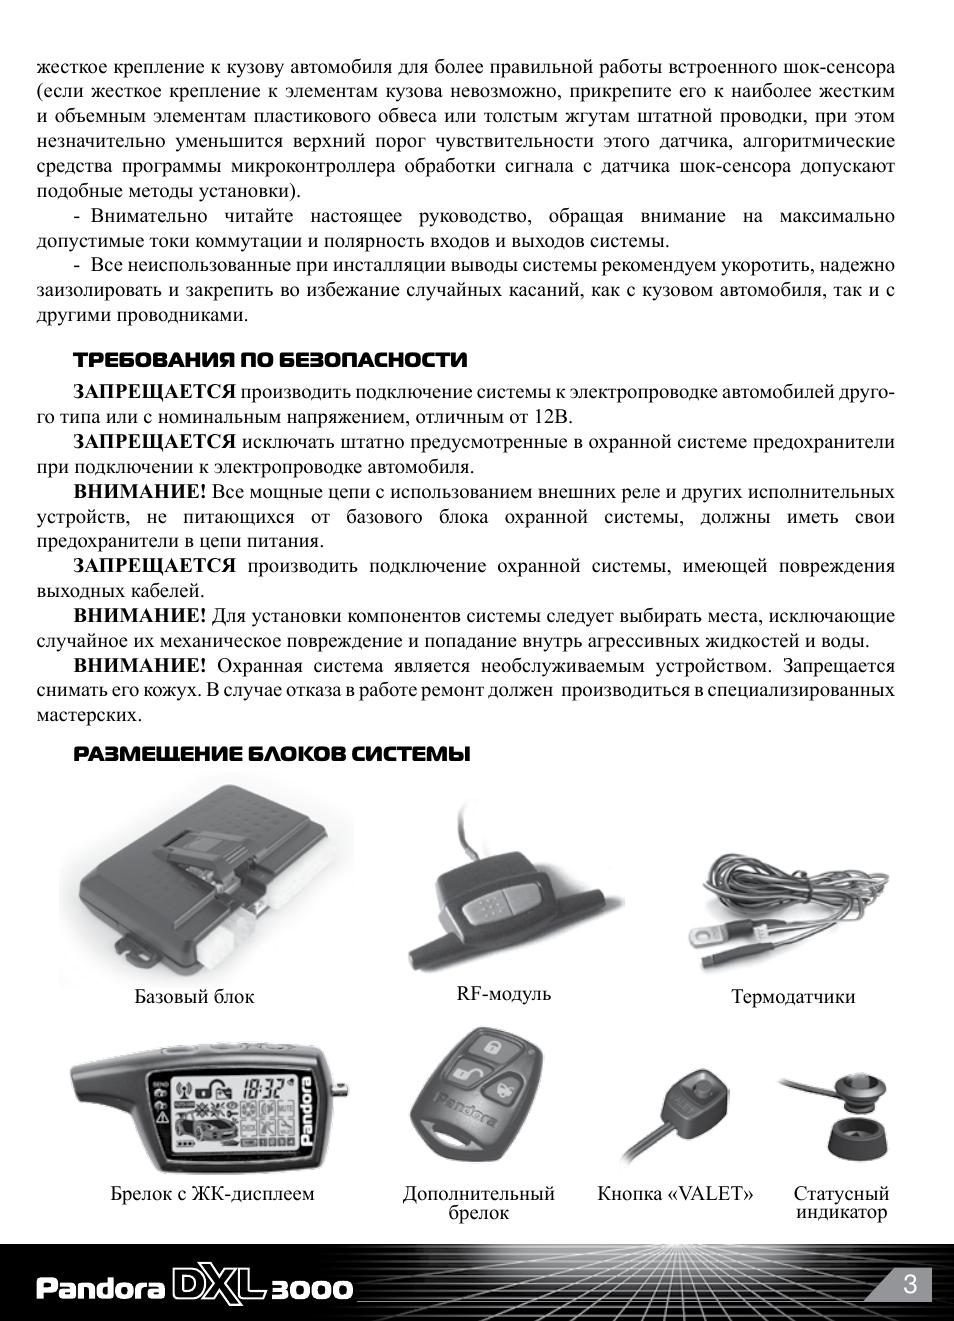 pandora dxl 3000 инструкция pdf